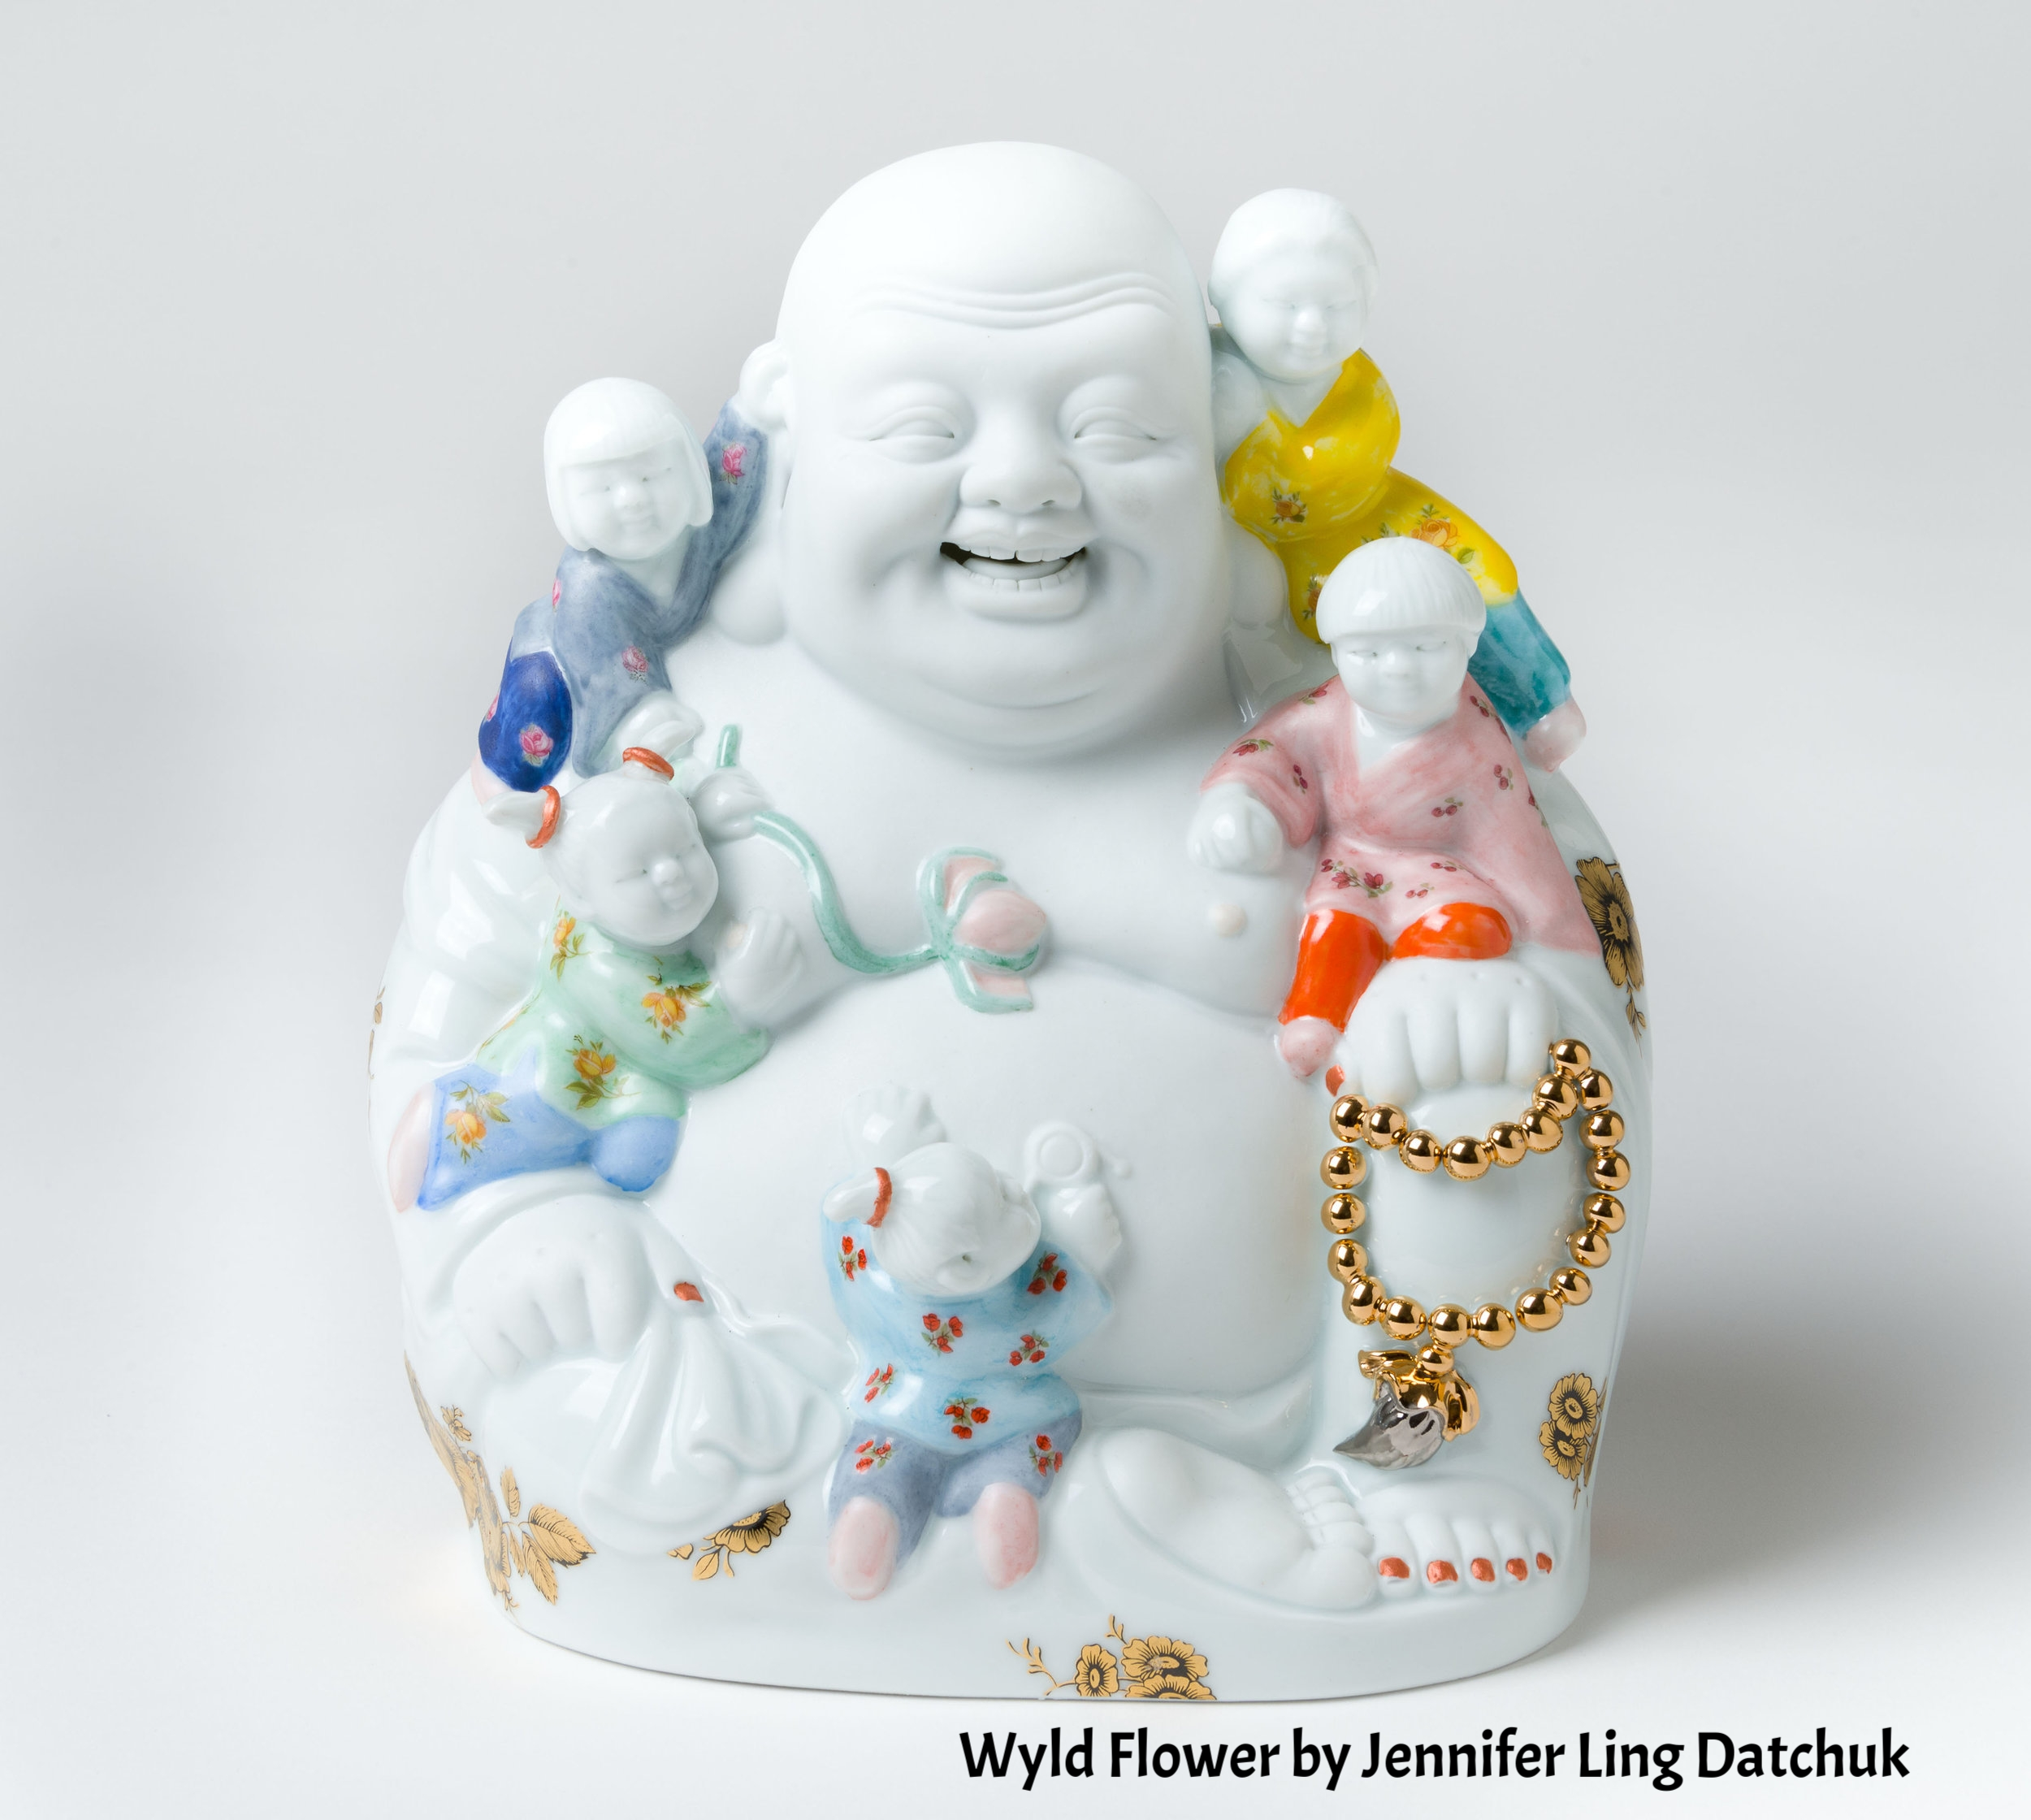 Datchuk wyldflower_front, $3,400, 9x8.jpg